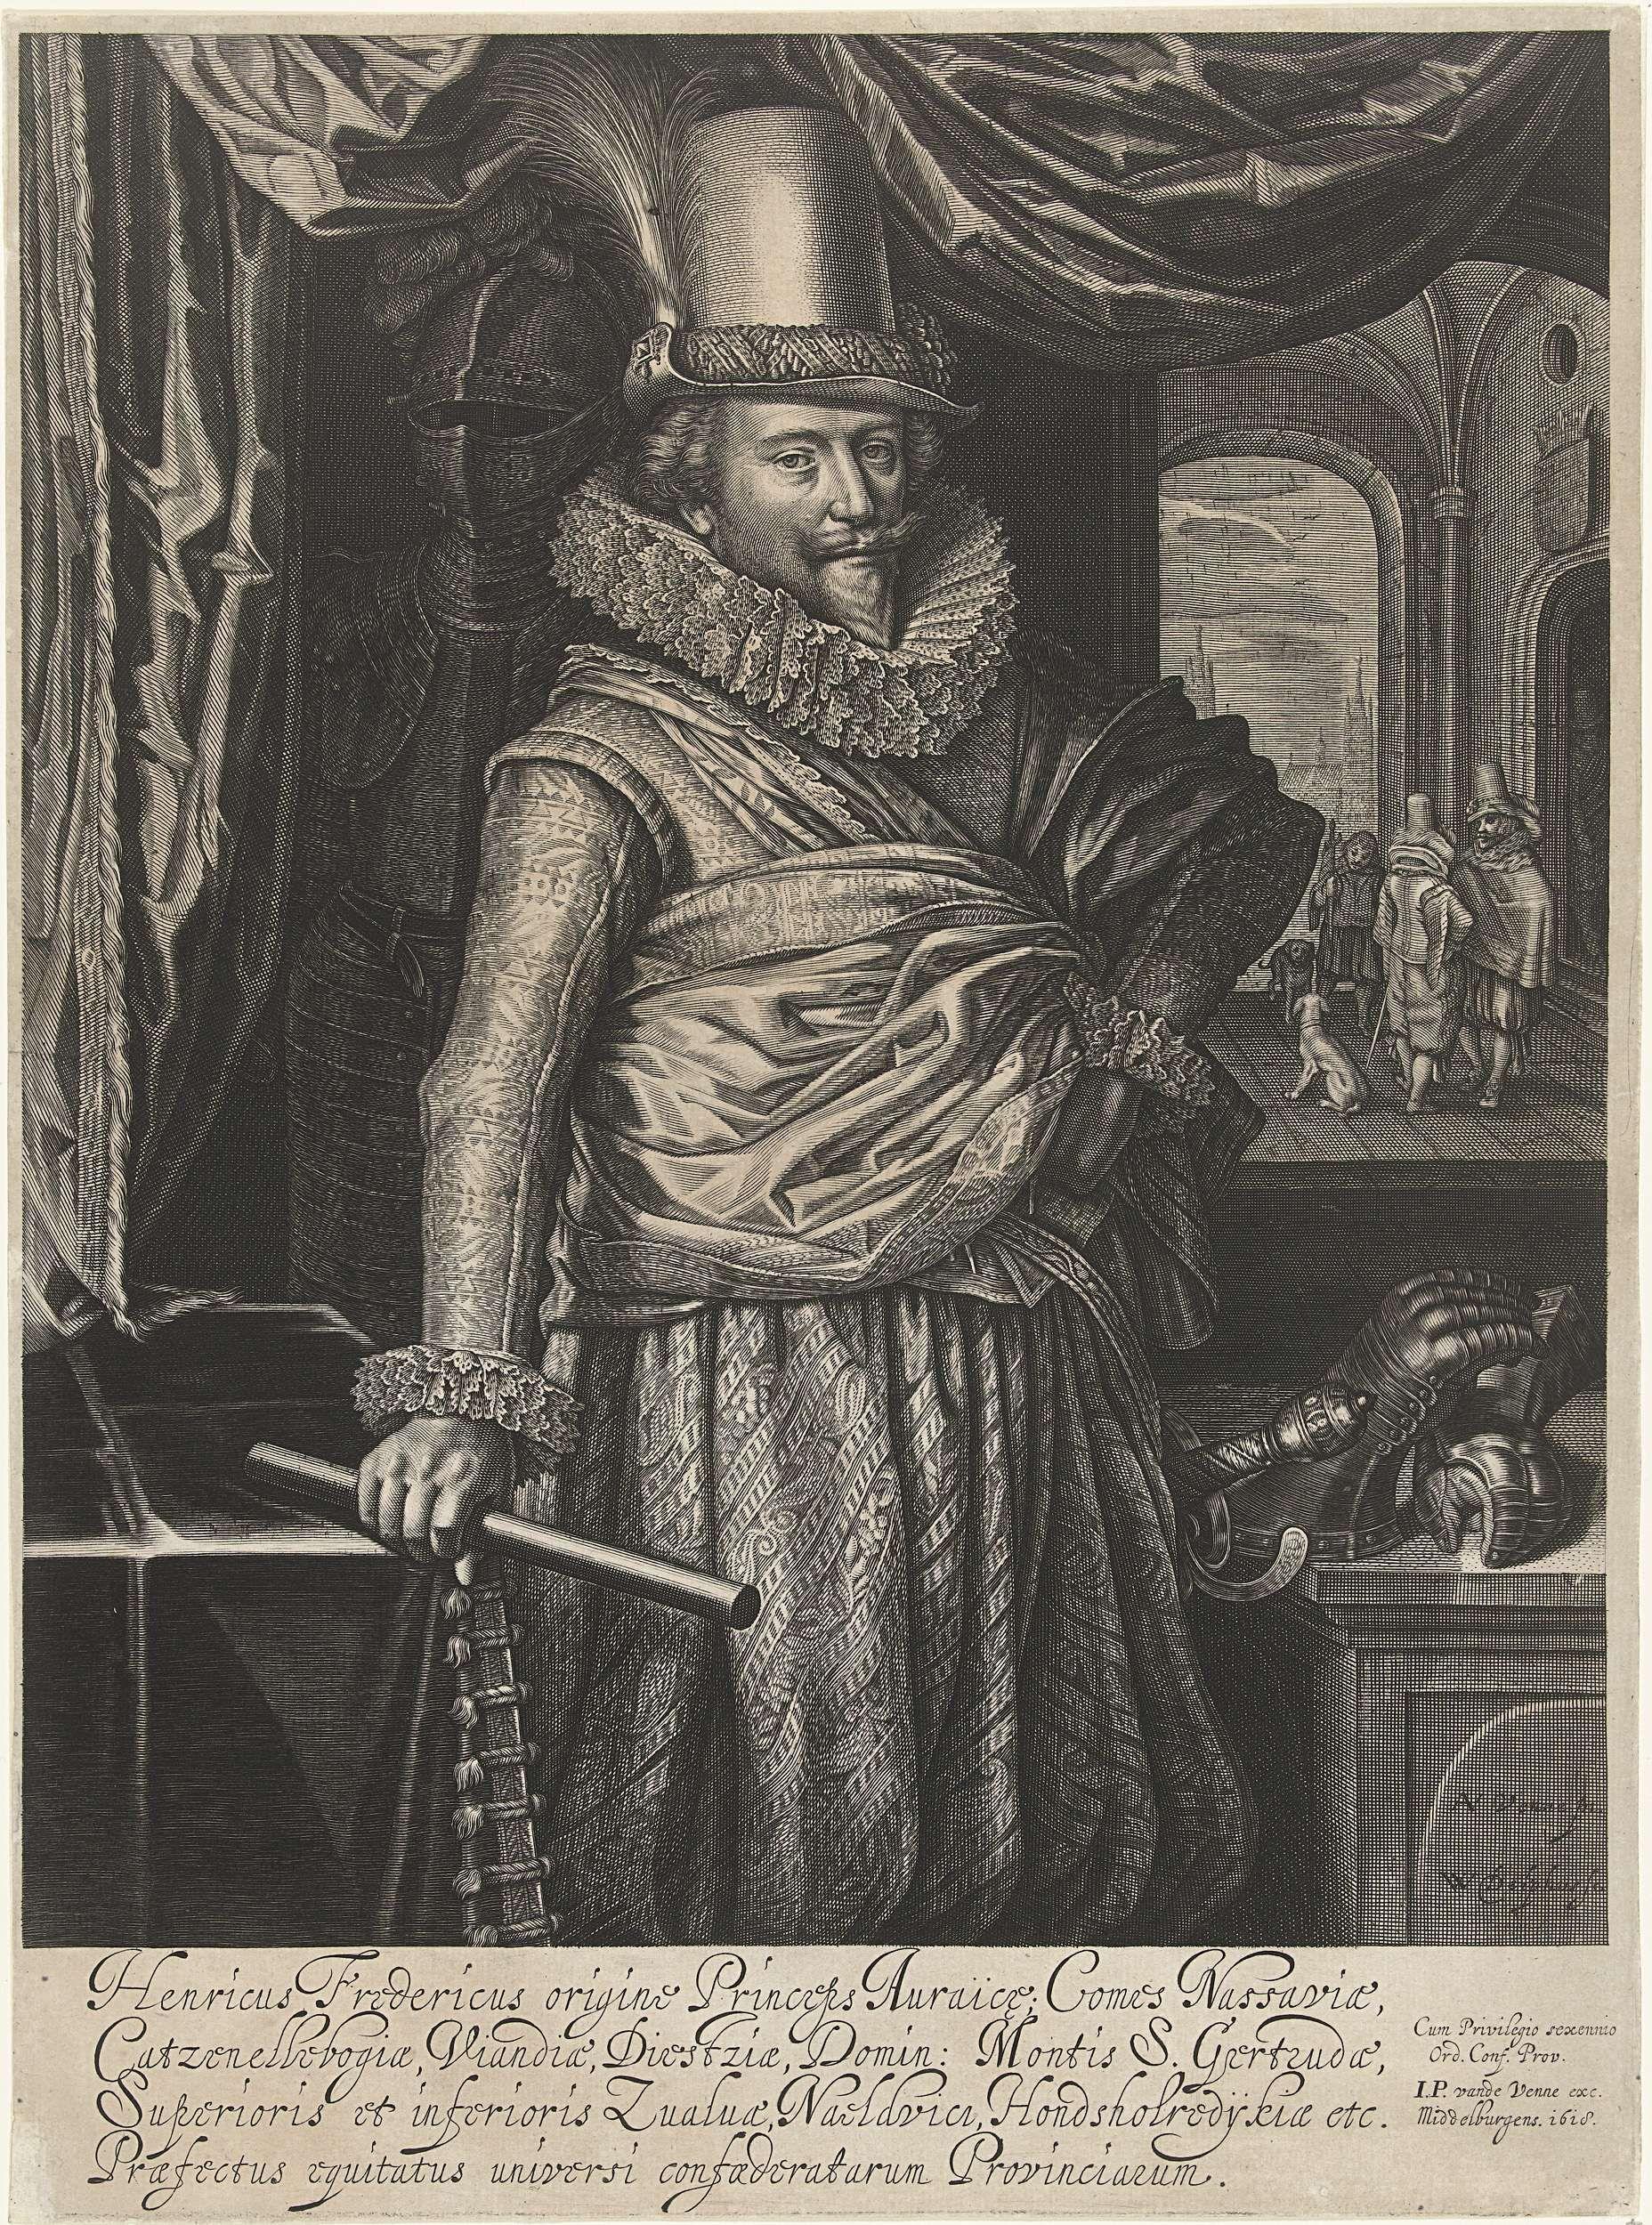 Willem Jacobsz Delff Portret Van Frederik Hendrik Prins